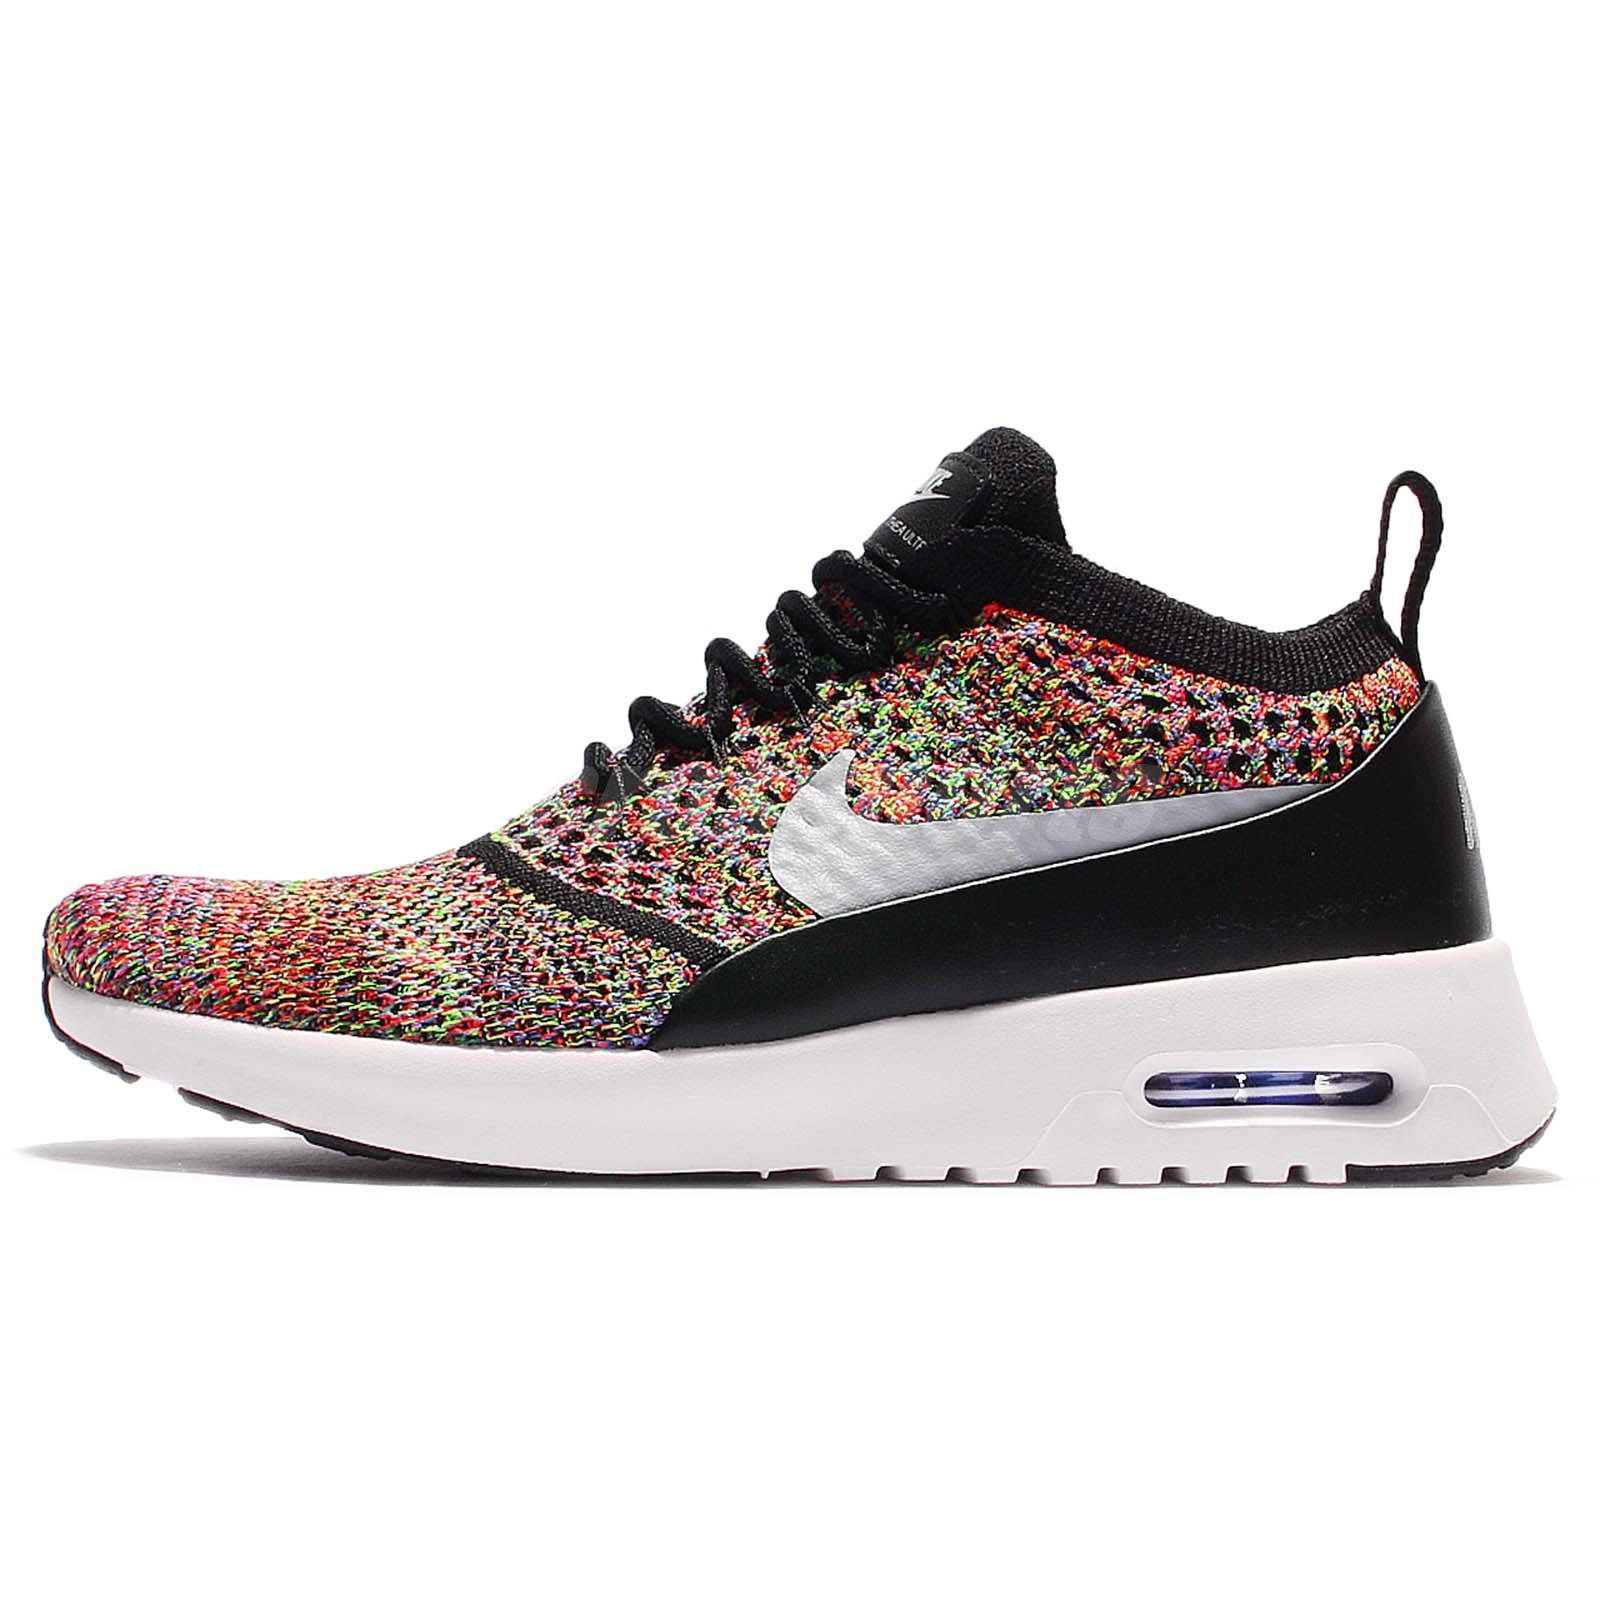 Nike Air Max Flyknit Multicolor Comprar Coches Usados